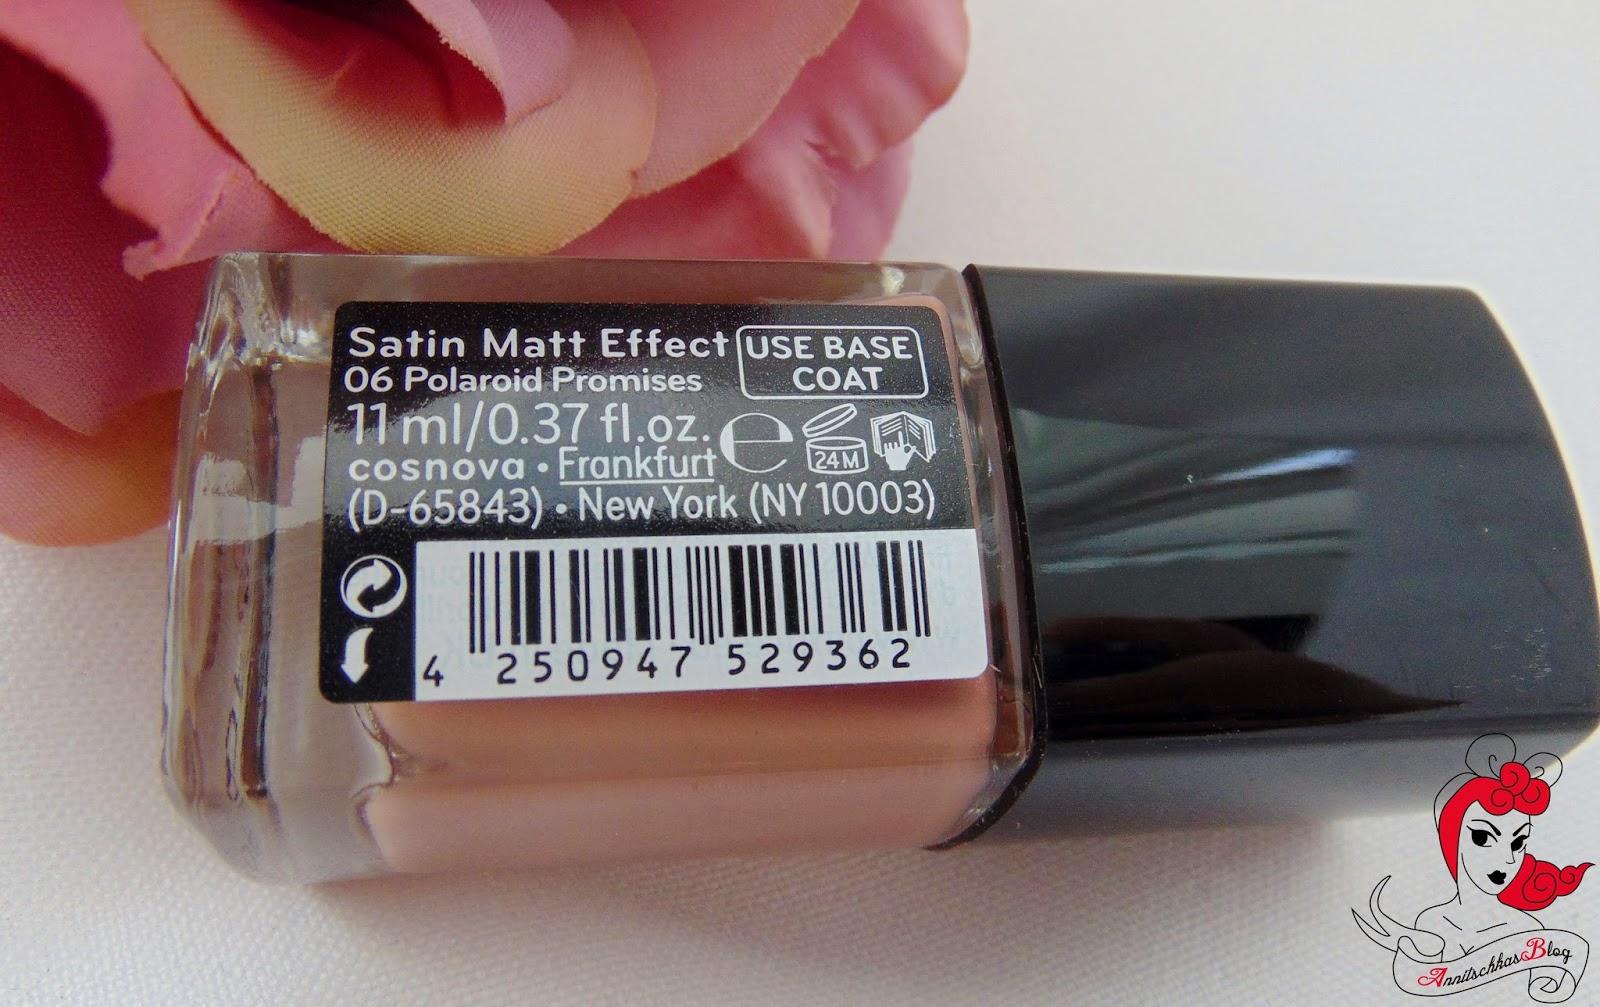 Catrice - Luxury Vintage - Satin Matt Effekt - 06 Polaroid Promises - www.annitschkasblog.de